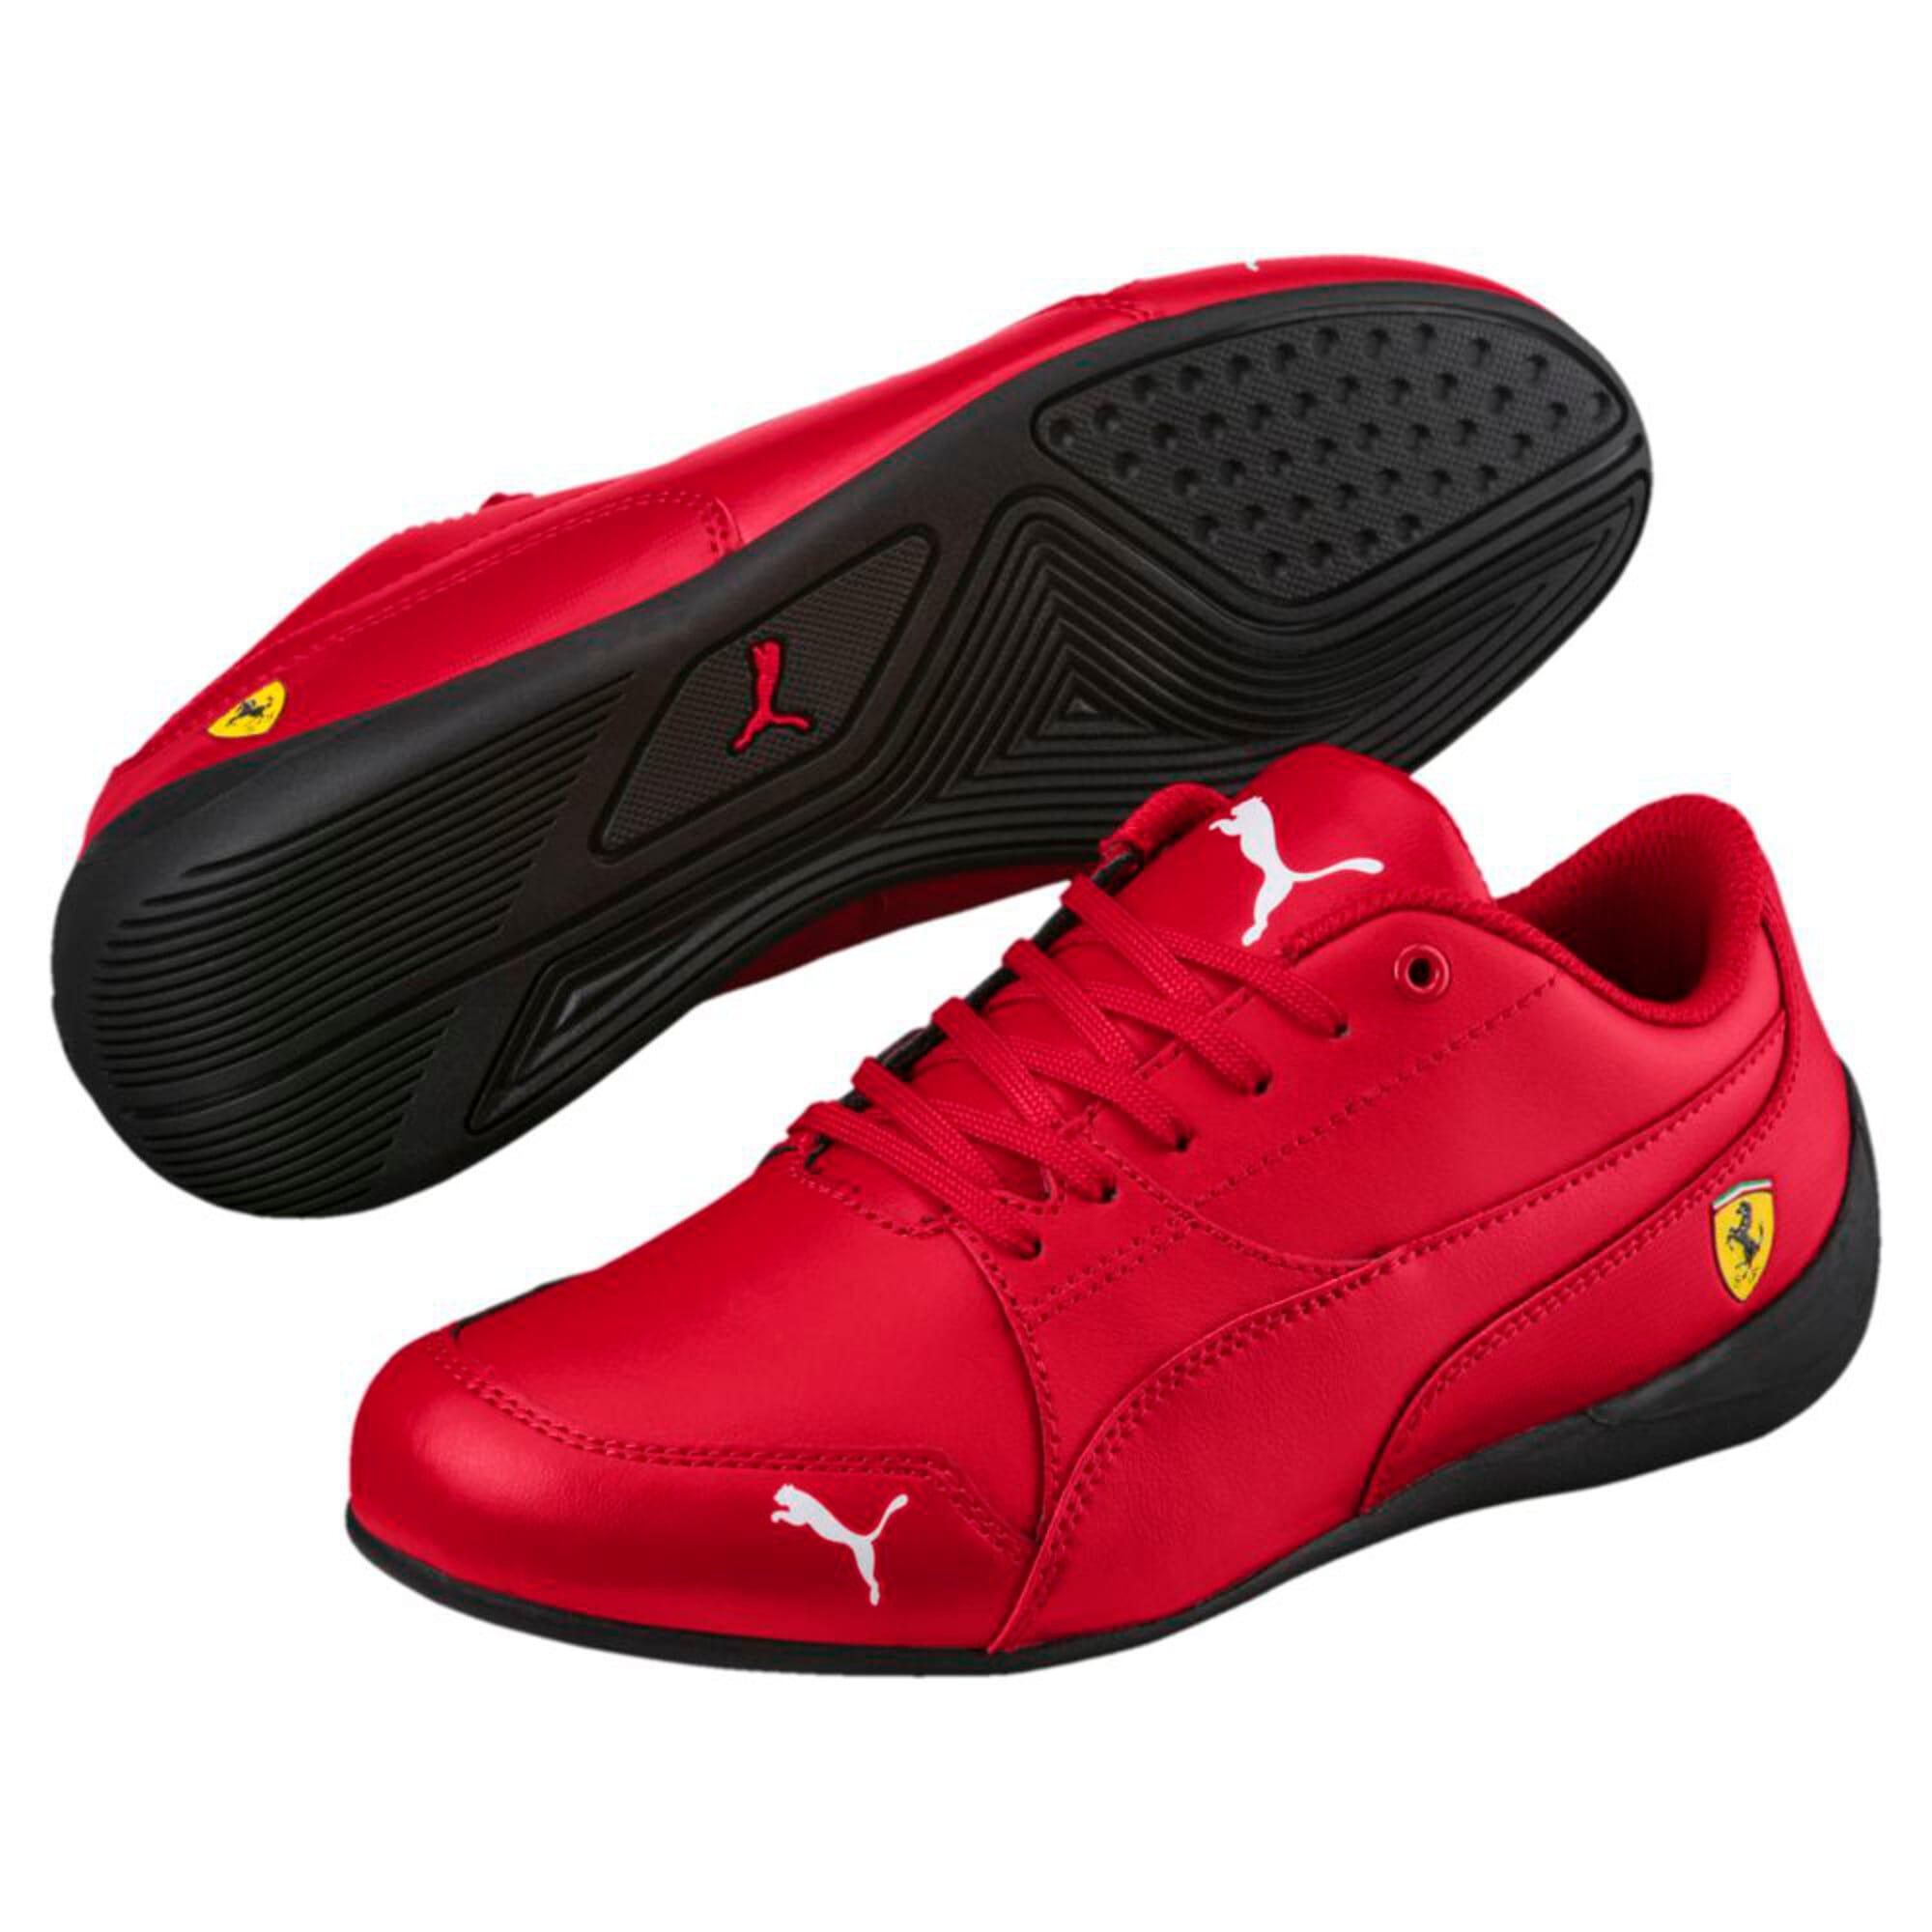 Thumbnail 6 of Ferrari Drift Cat 7 Kids' Trainers, Rosso Corsa-Rosso Corsa, medium-IND